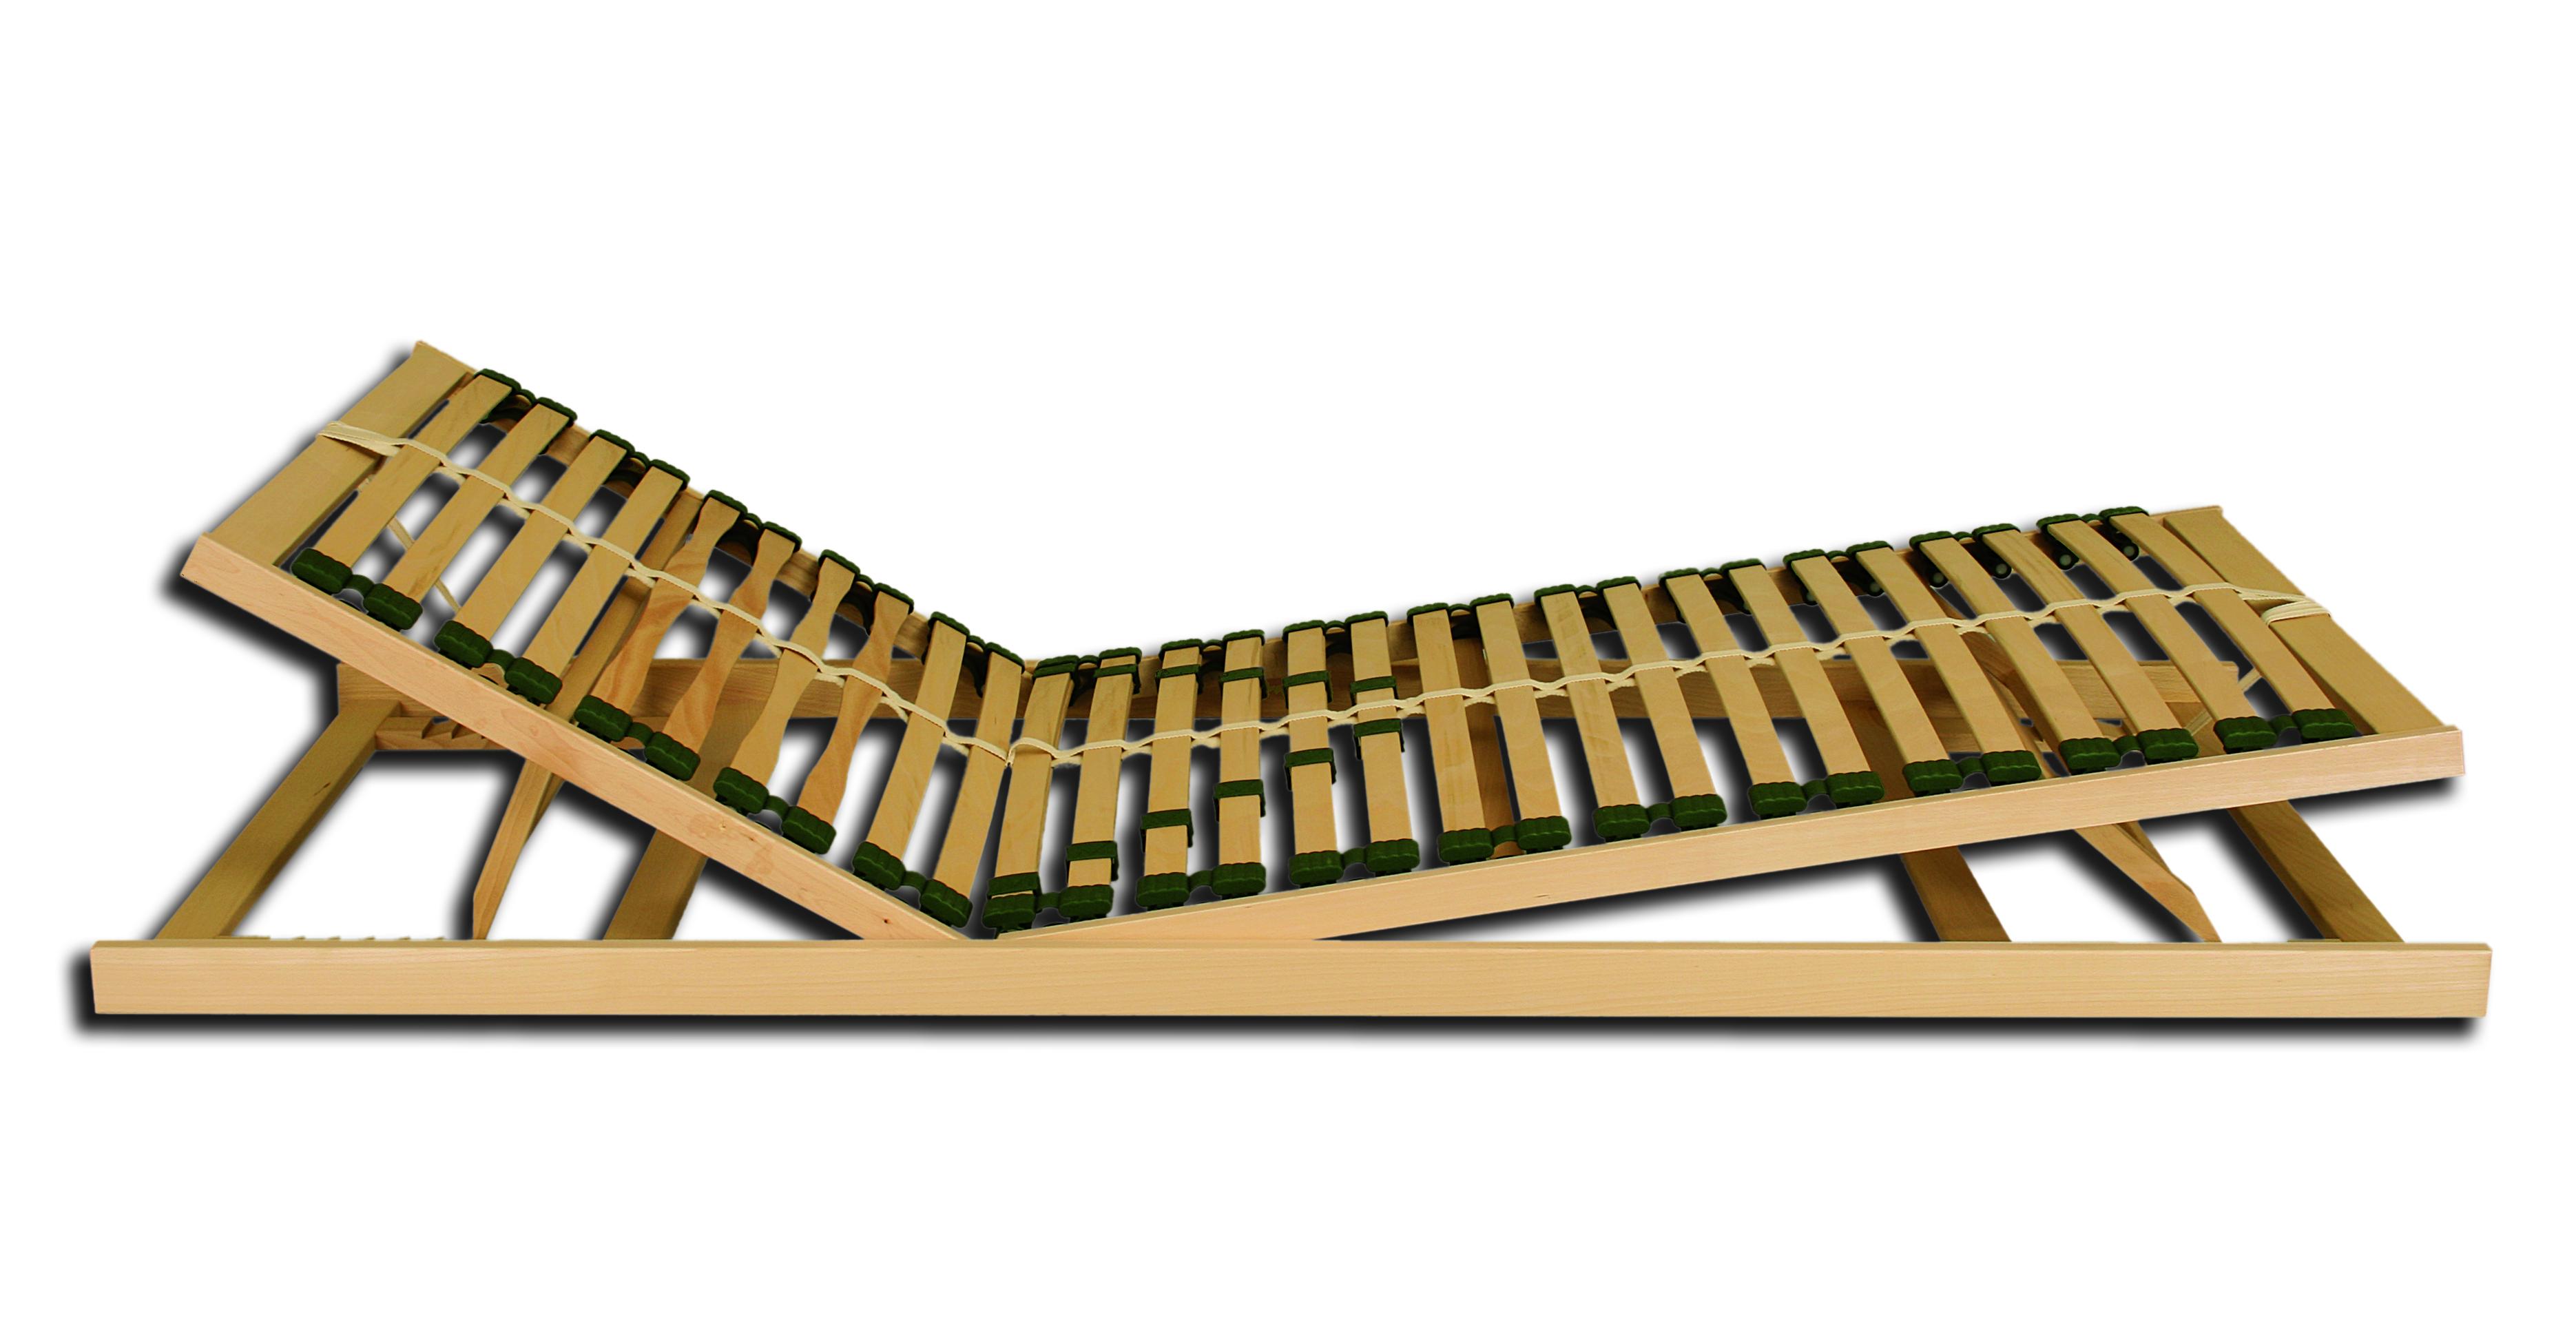 pressetexte zur kindermatratze coco. Black Bedroom Furniture Sets. Home Design Ideas